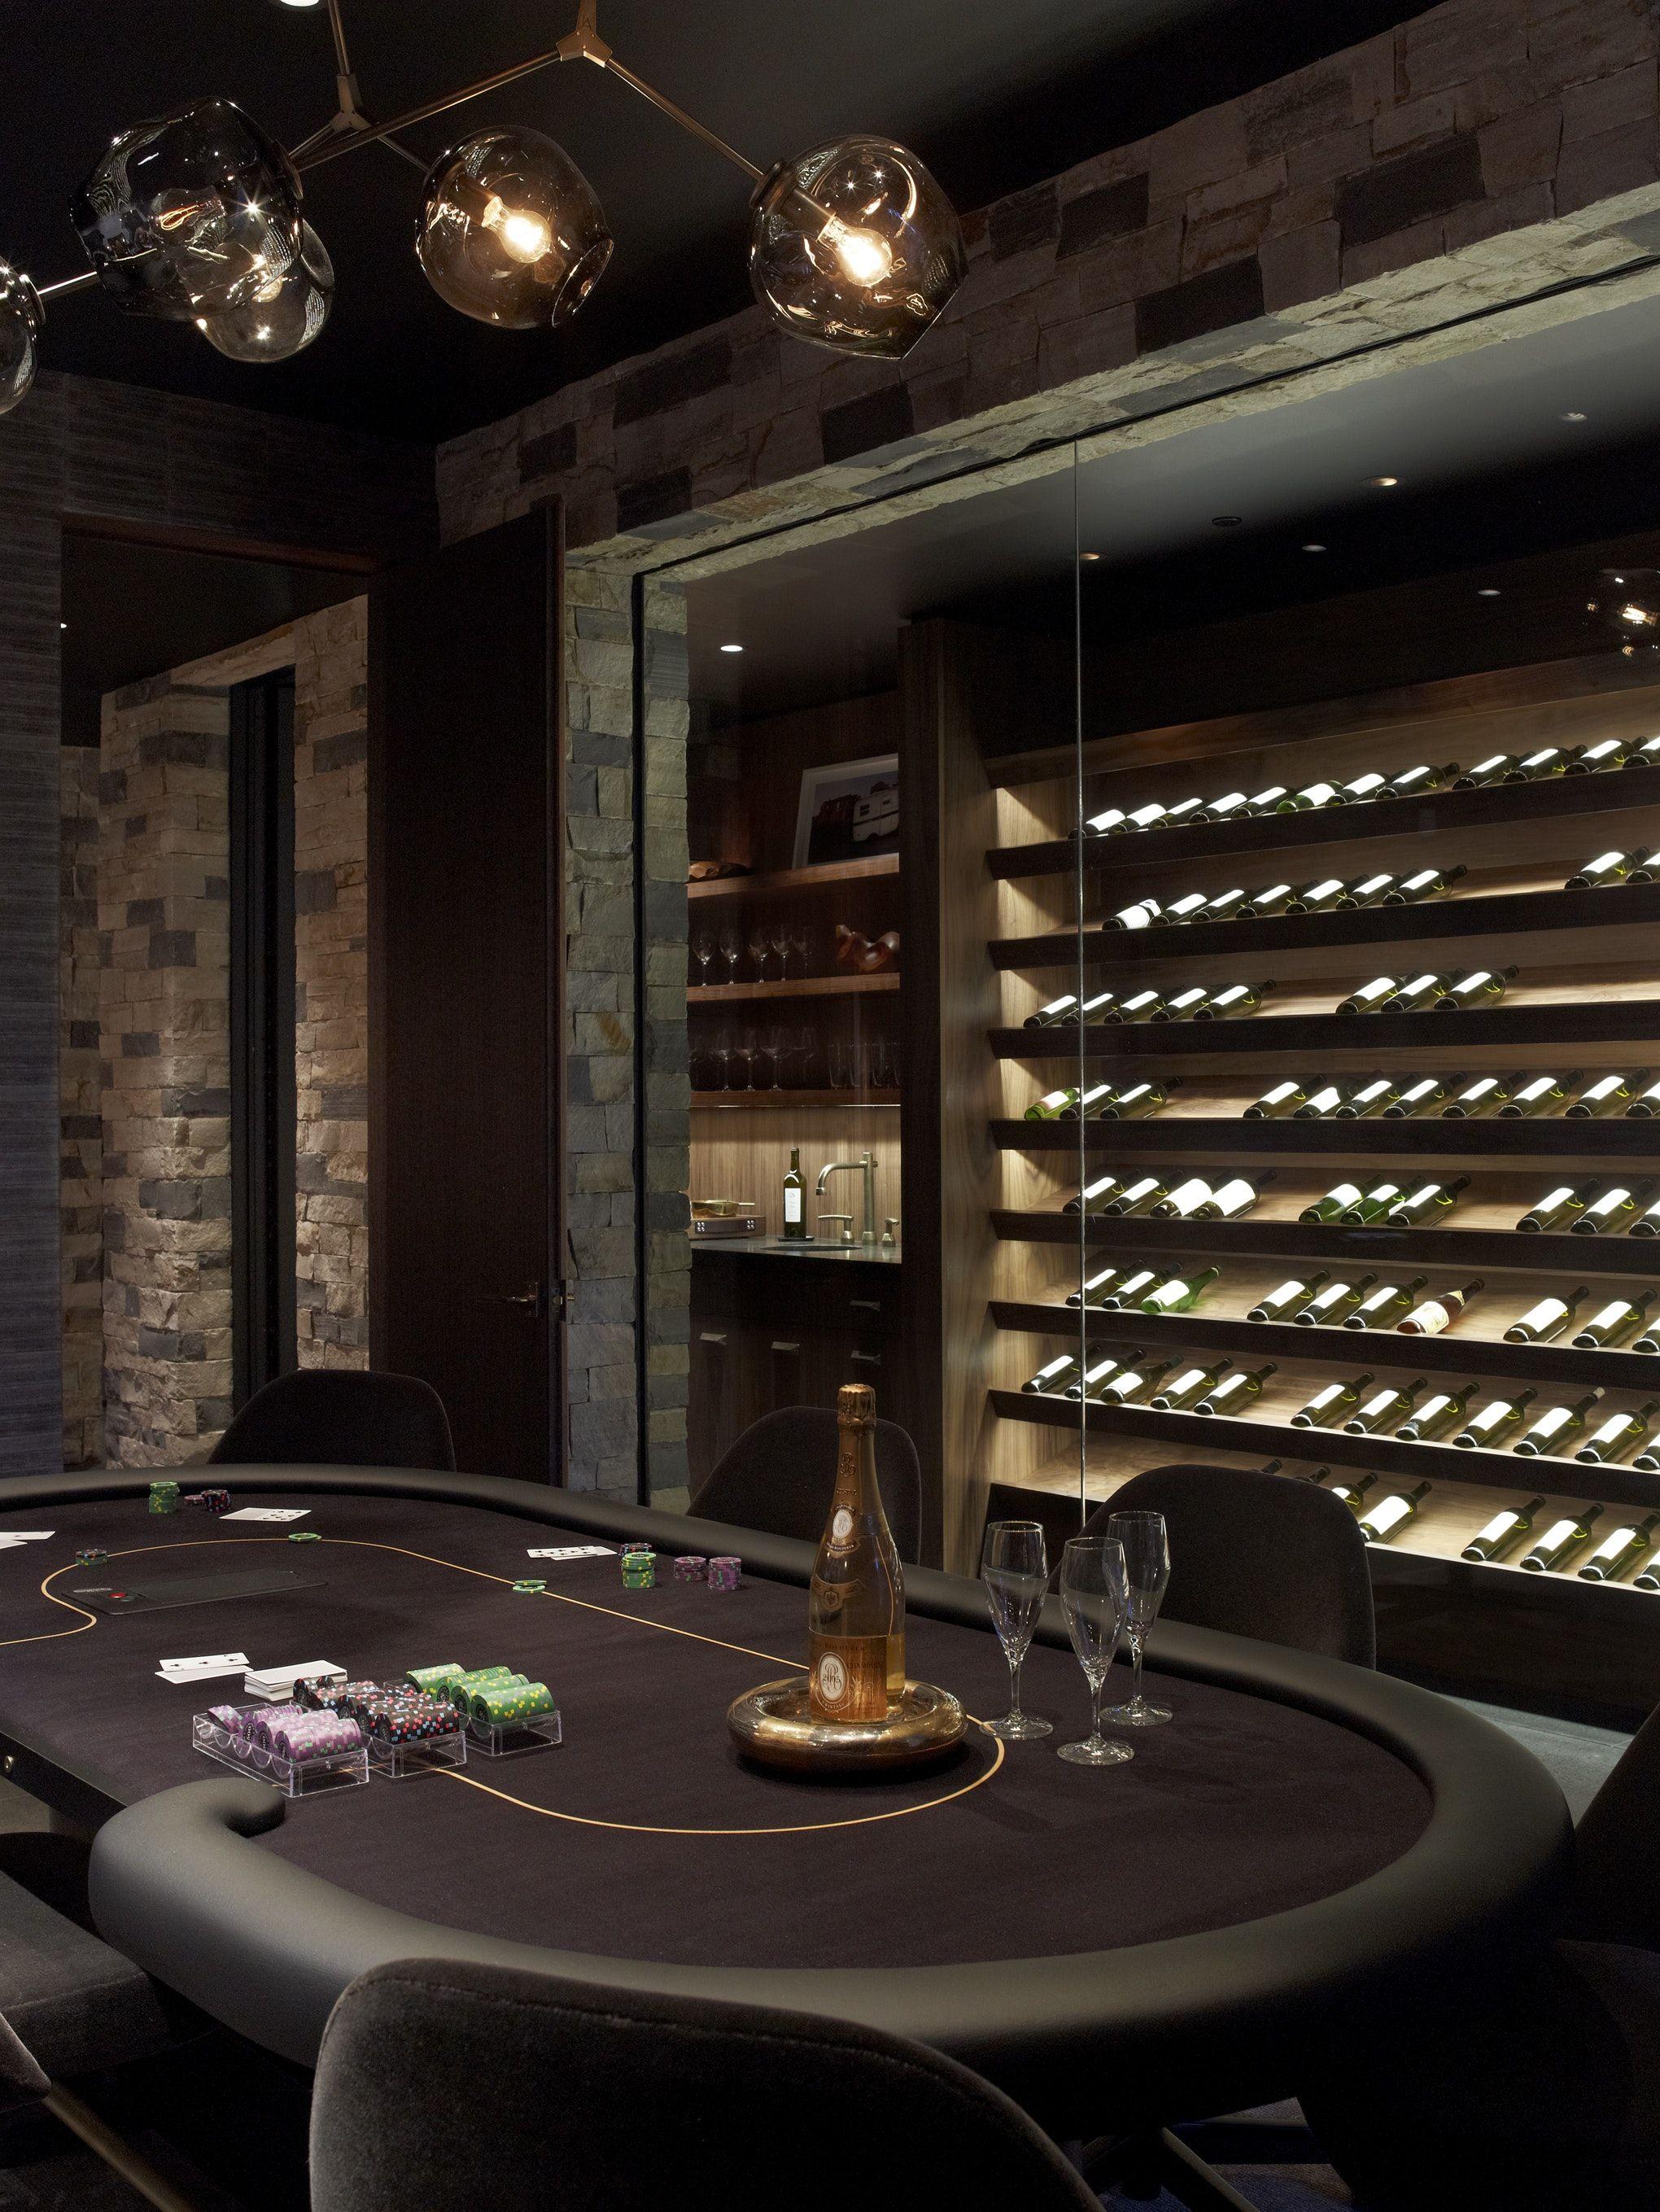 Design Your Room Game: Game Room Design, Game Room, Wine Cellar Design